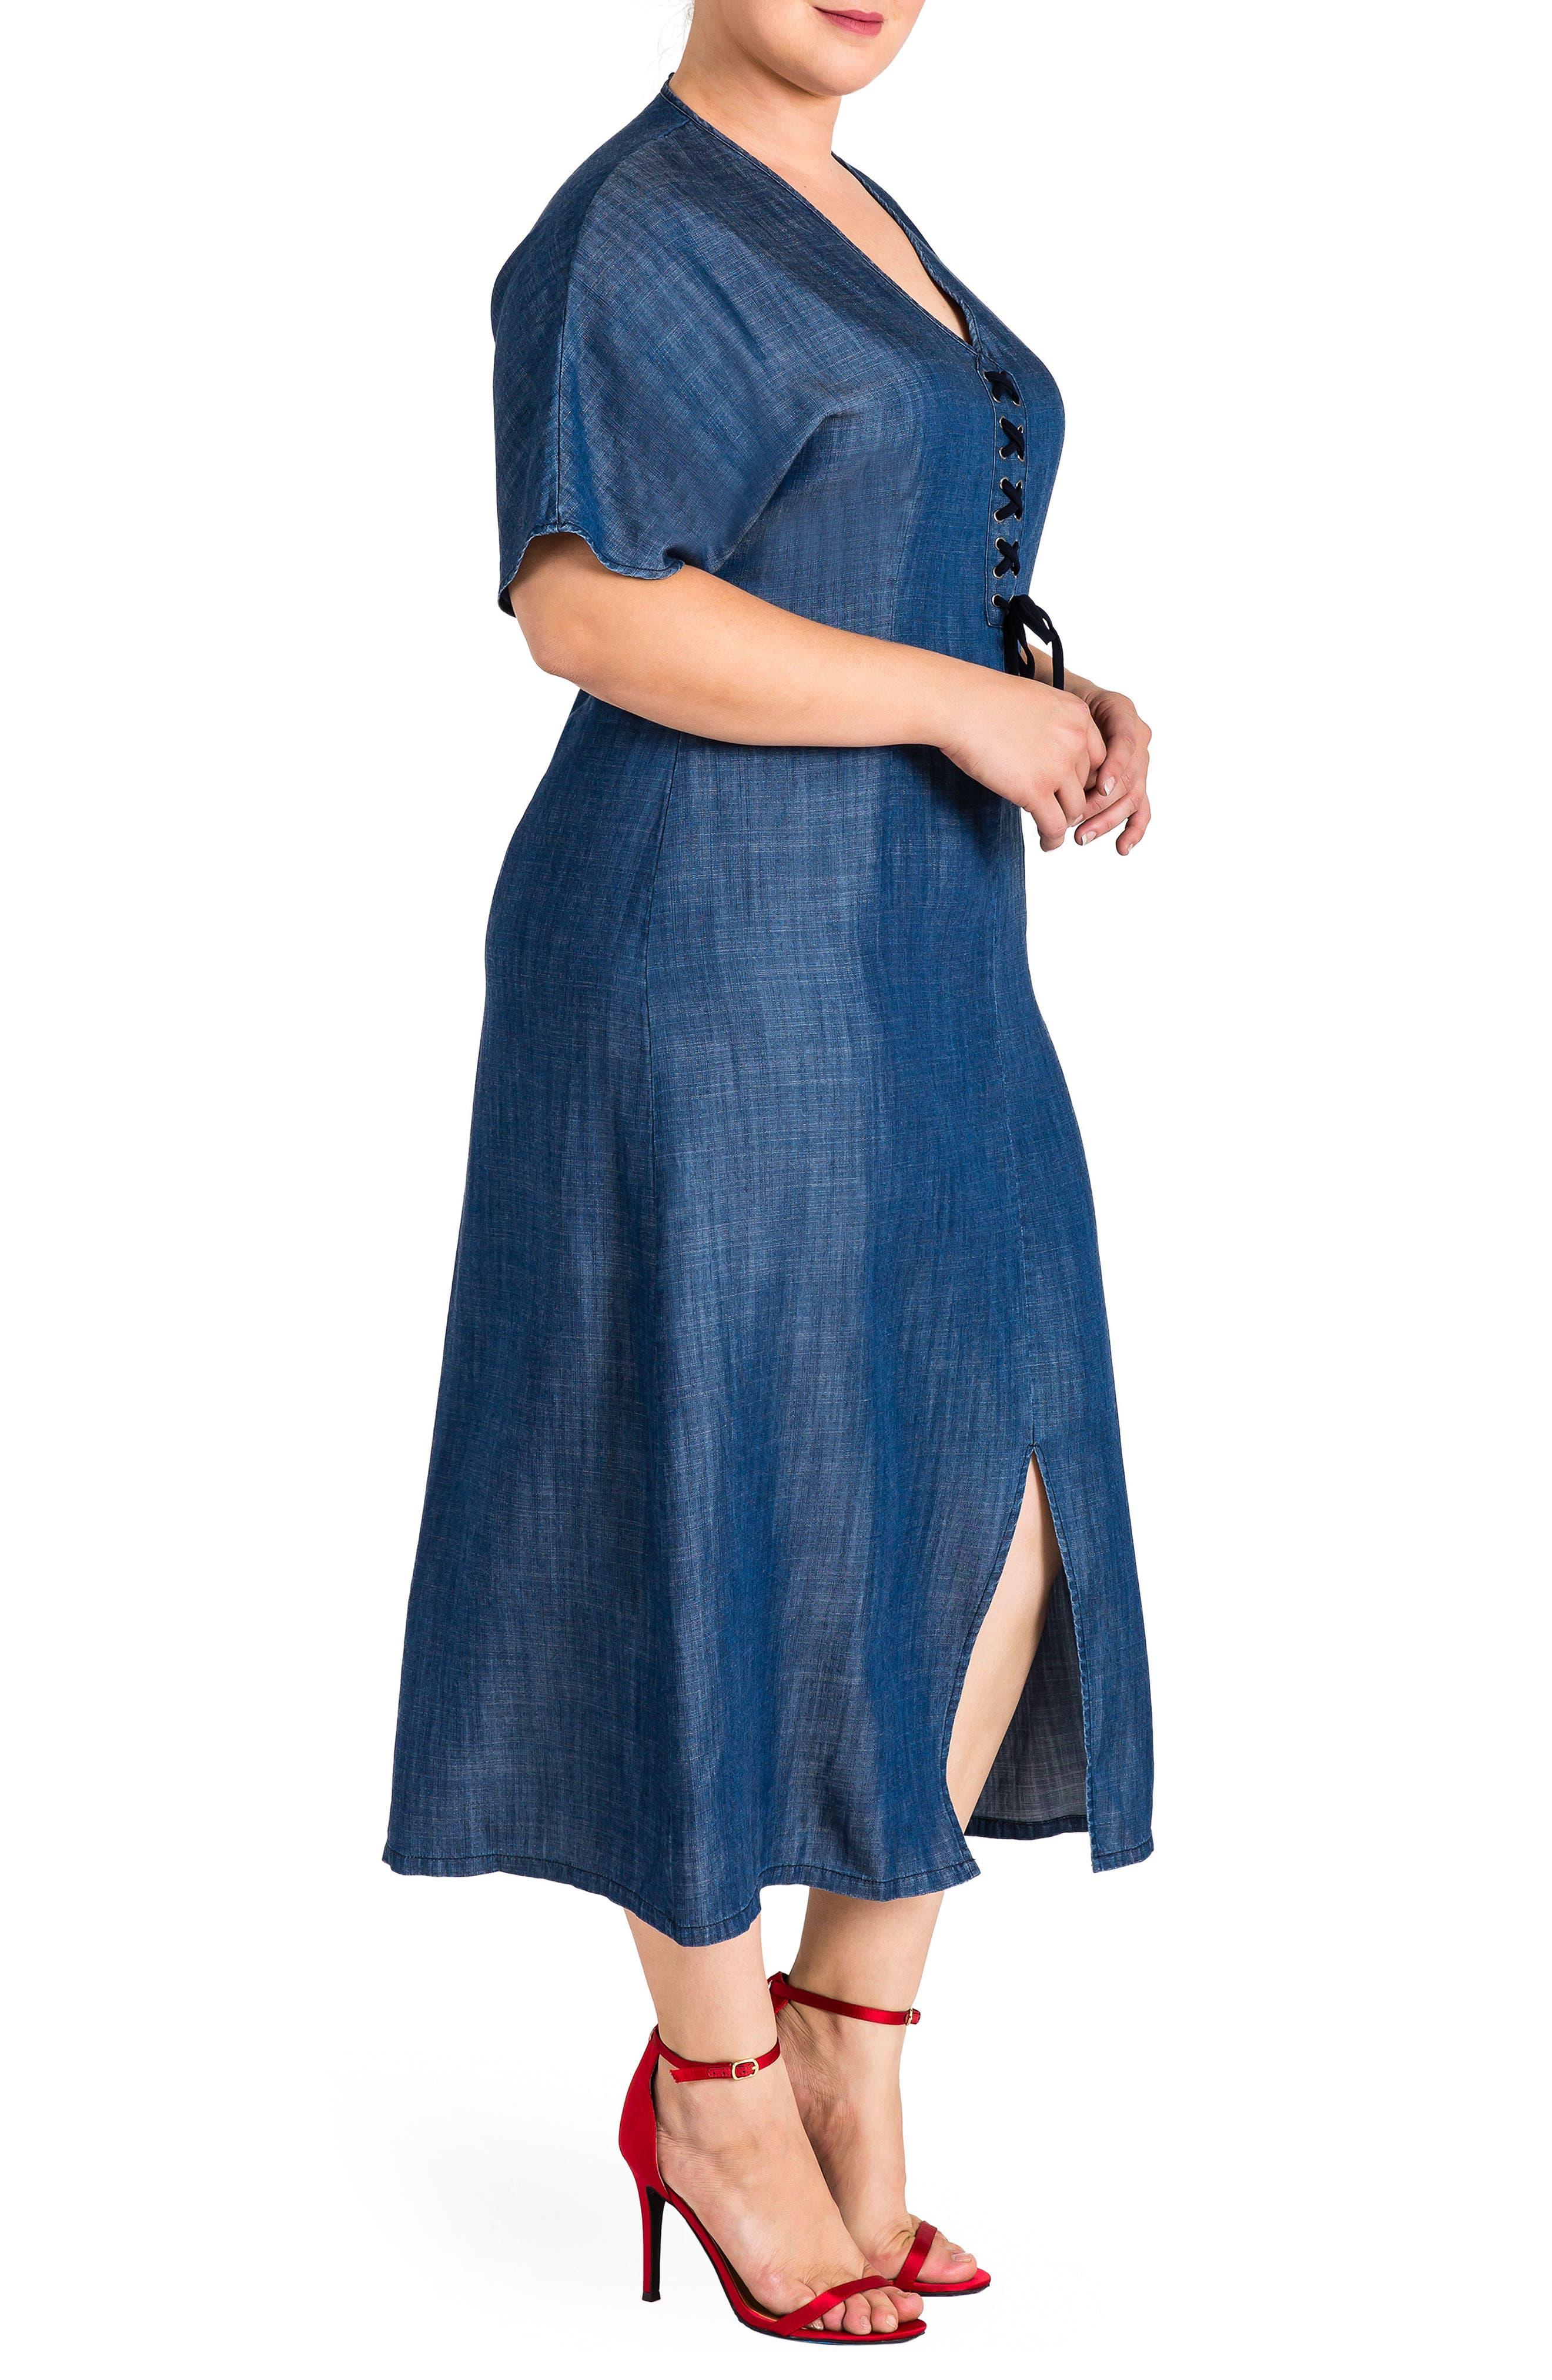 Standard & Practices Meme Tencel Midi Dress,                             Alternate thumbnail 3, color,                             NAVY